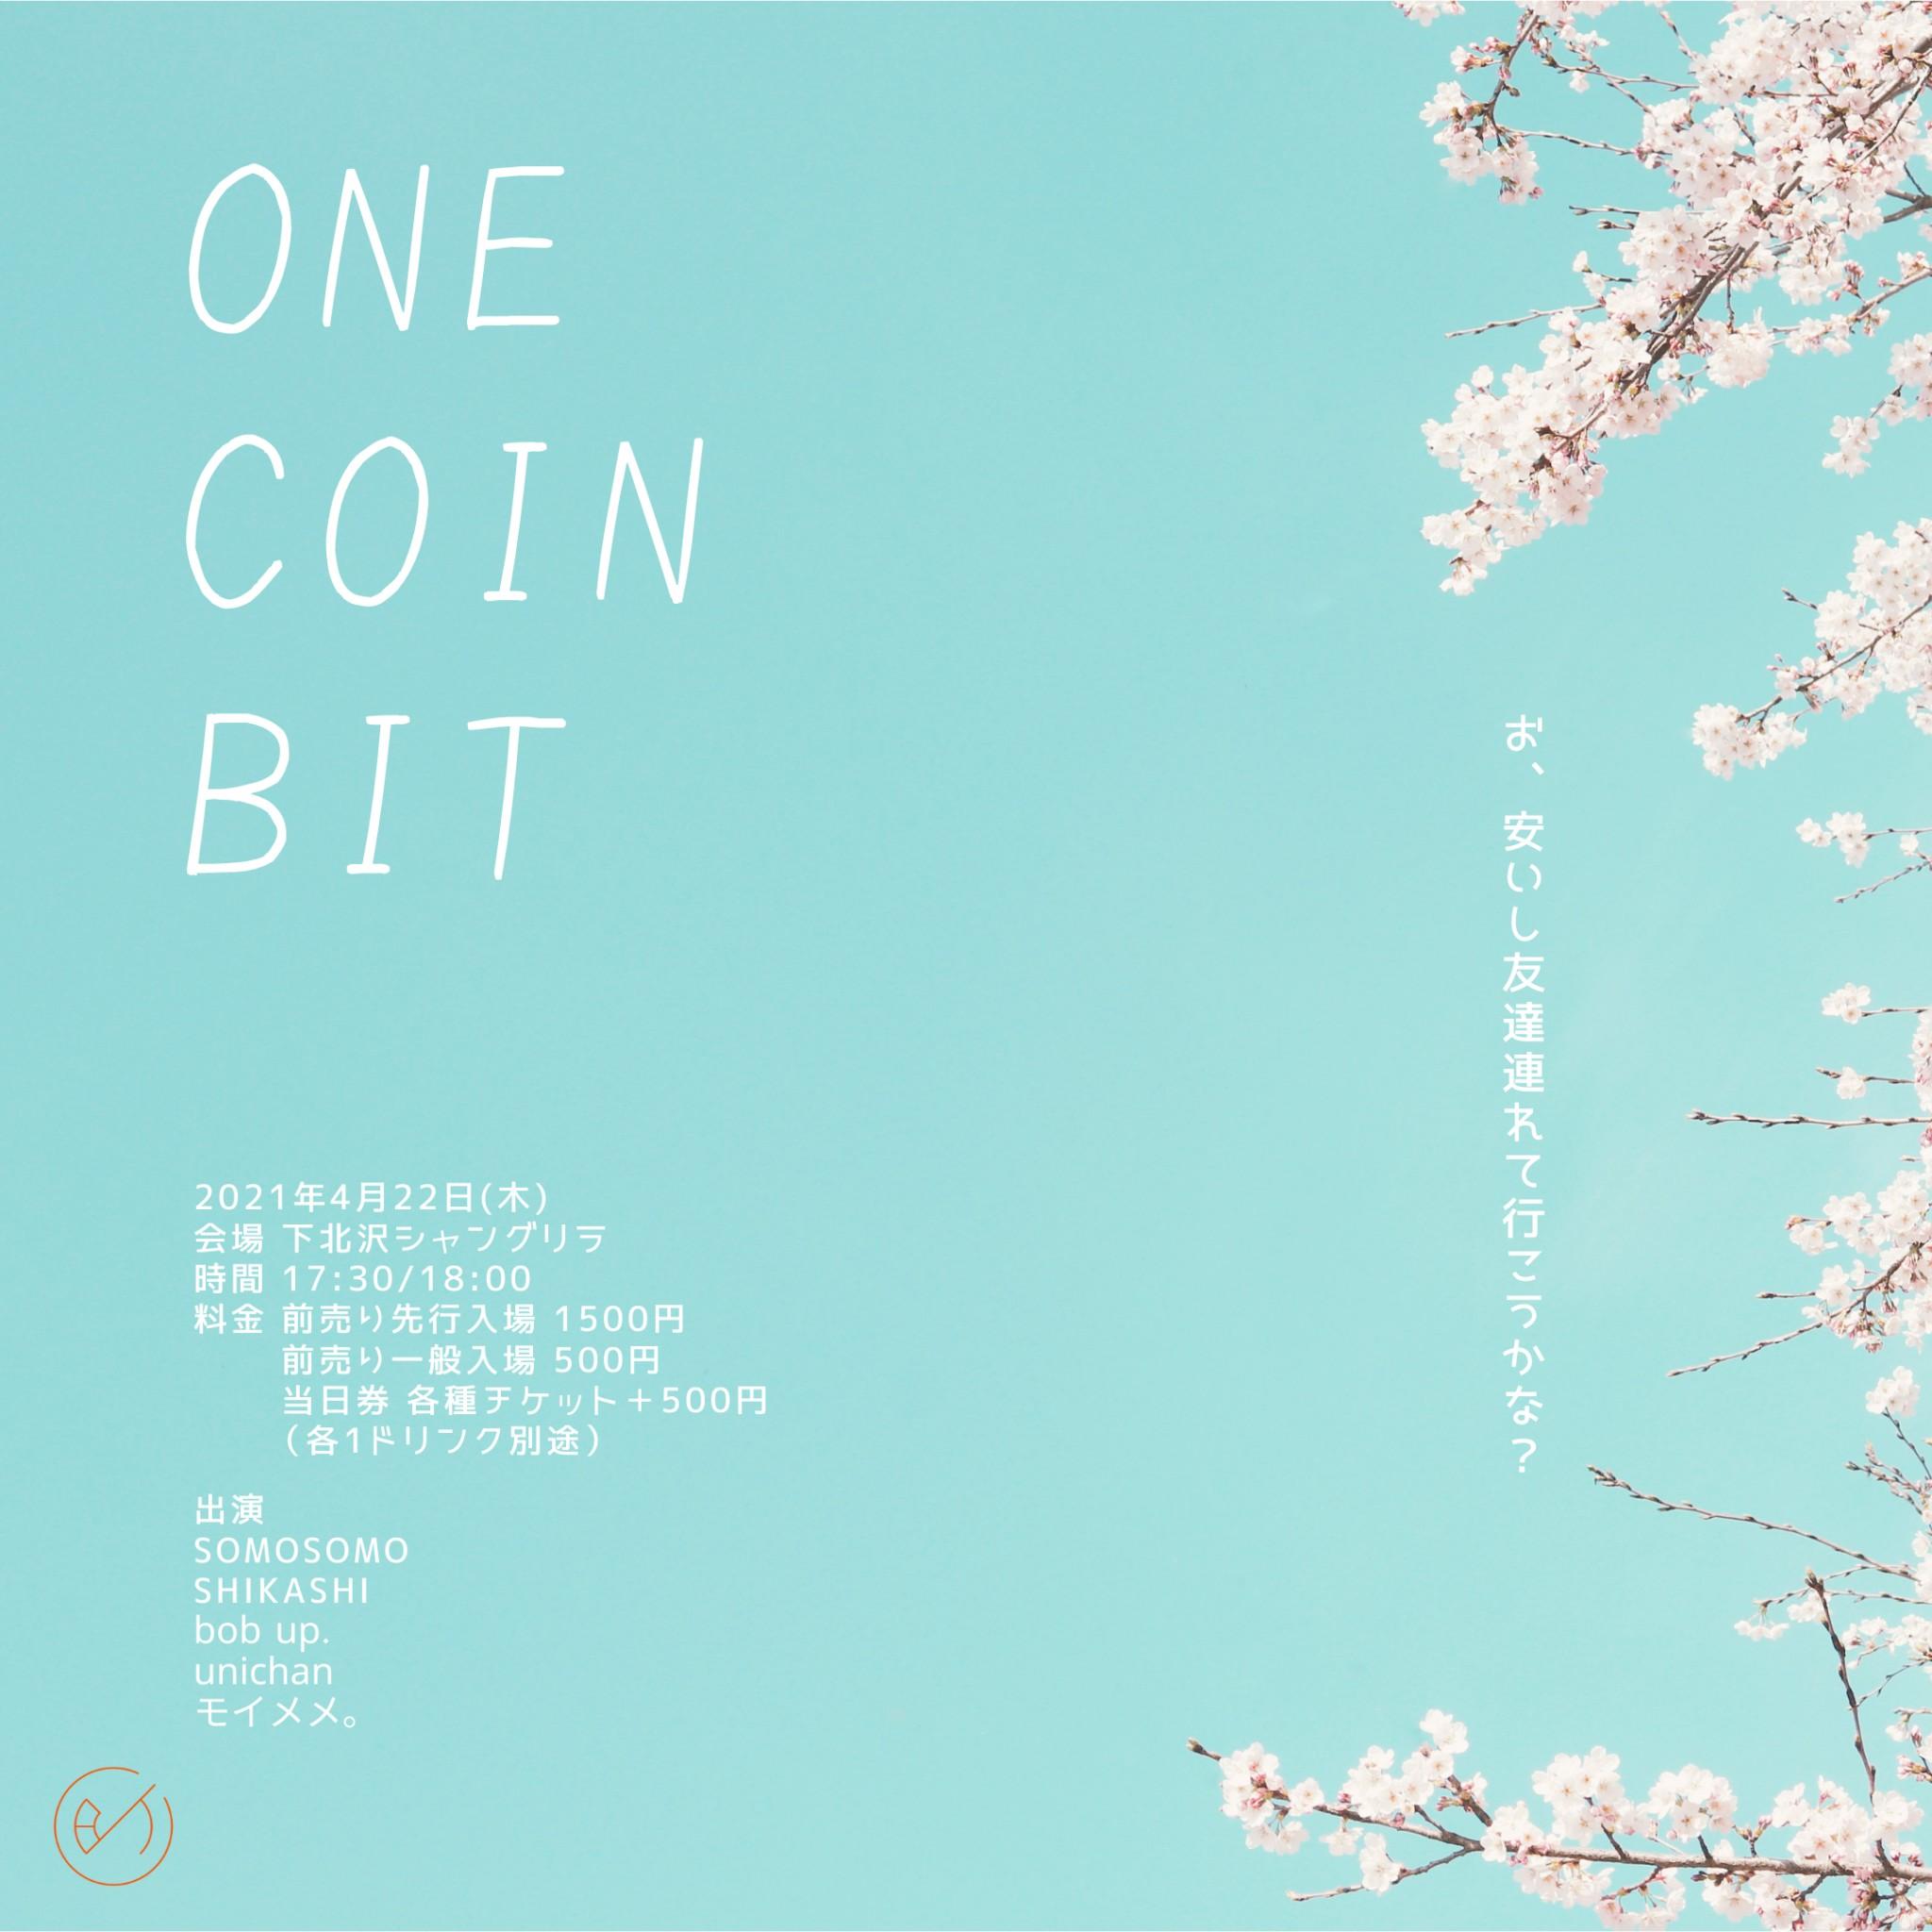 ONE COIN BIT